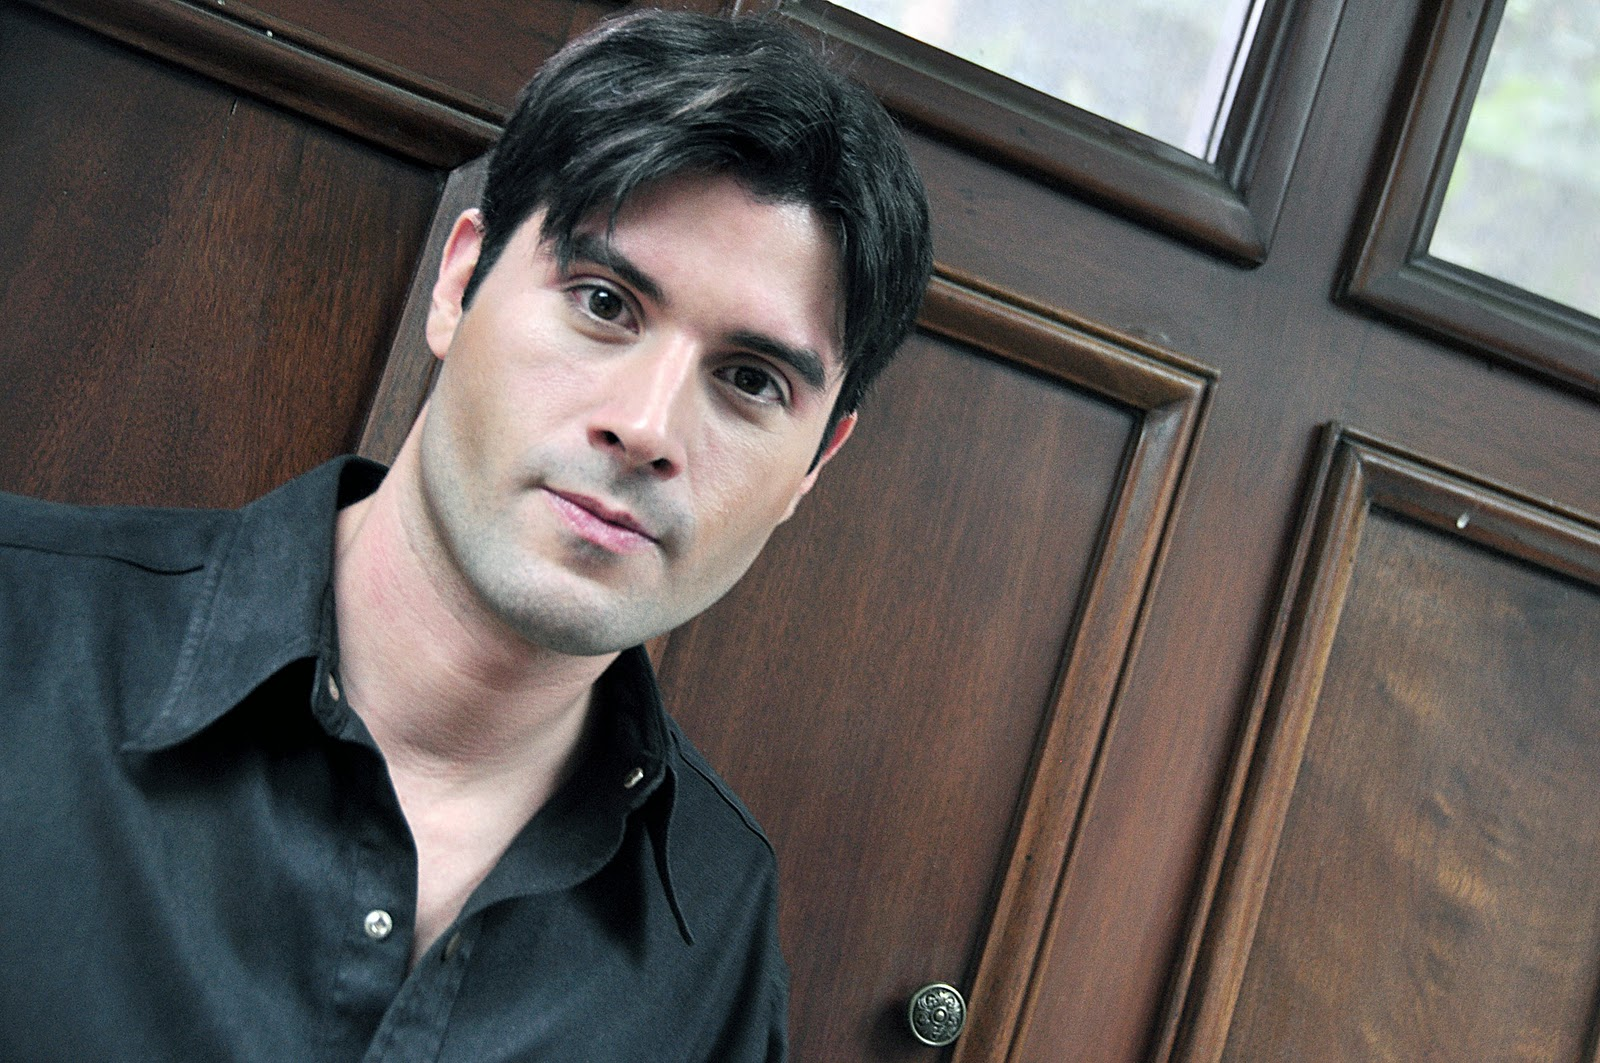 Jonathan Montenegro